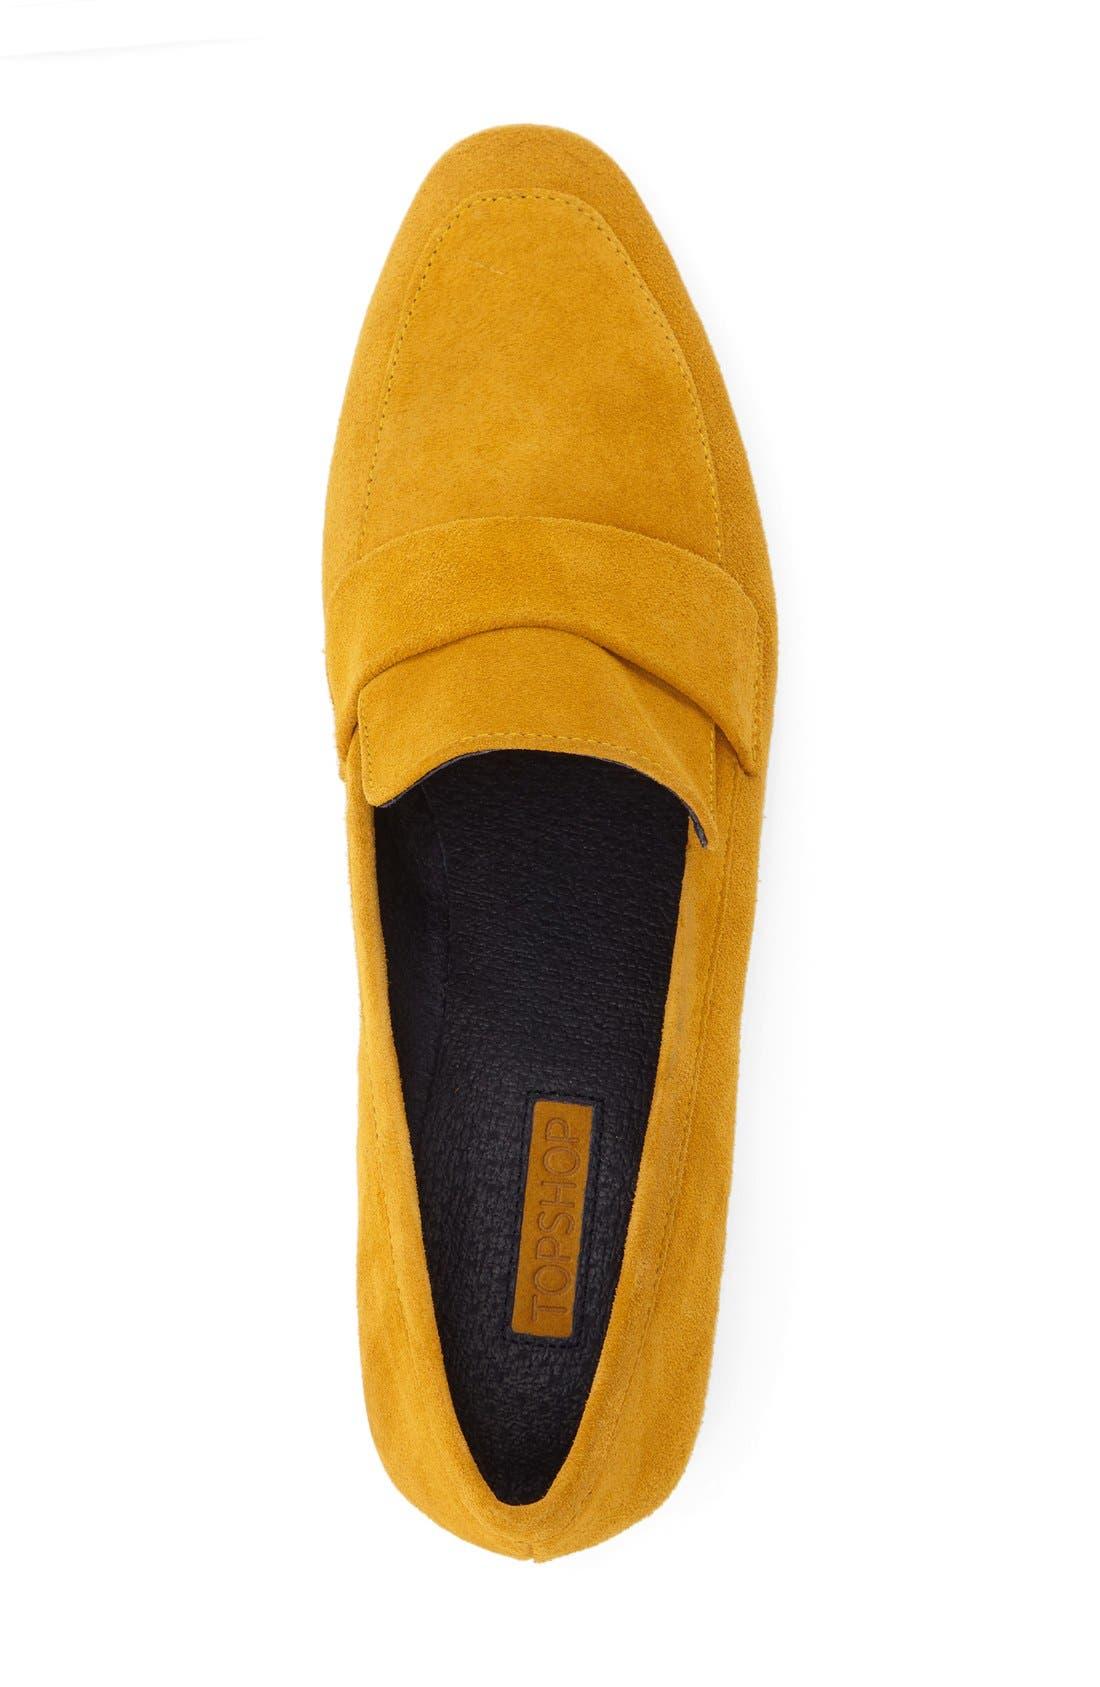 Alternate Image 3  - Topshop 'Karrot' Clear Heel Loafer (Women)